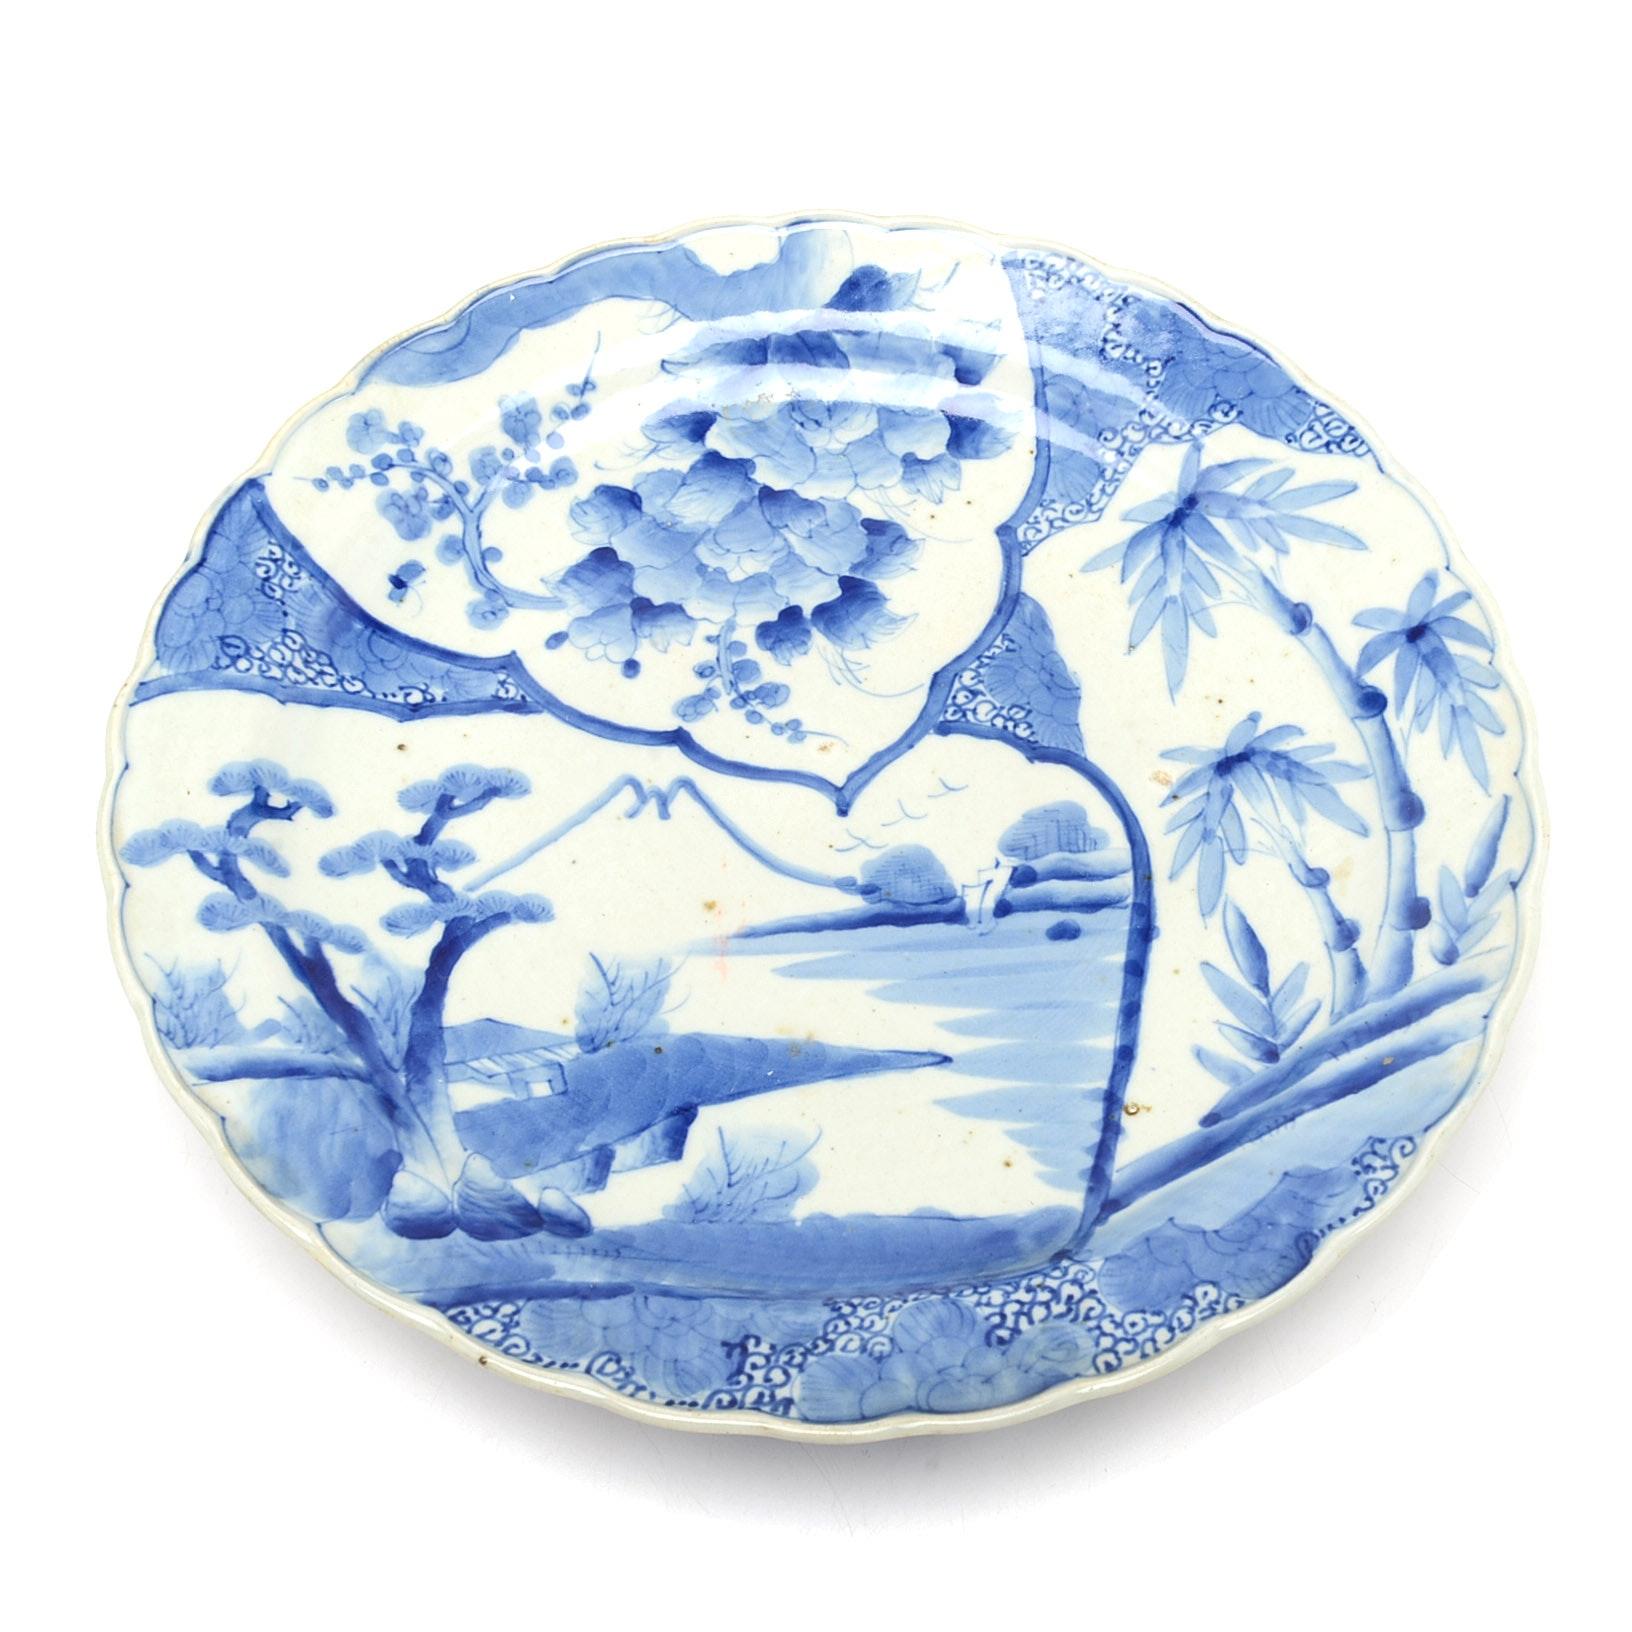 Vintage Chinese Ceramic Platter